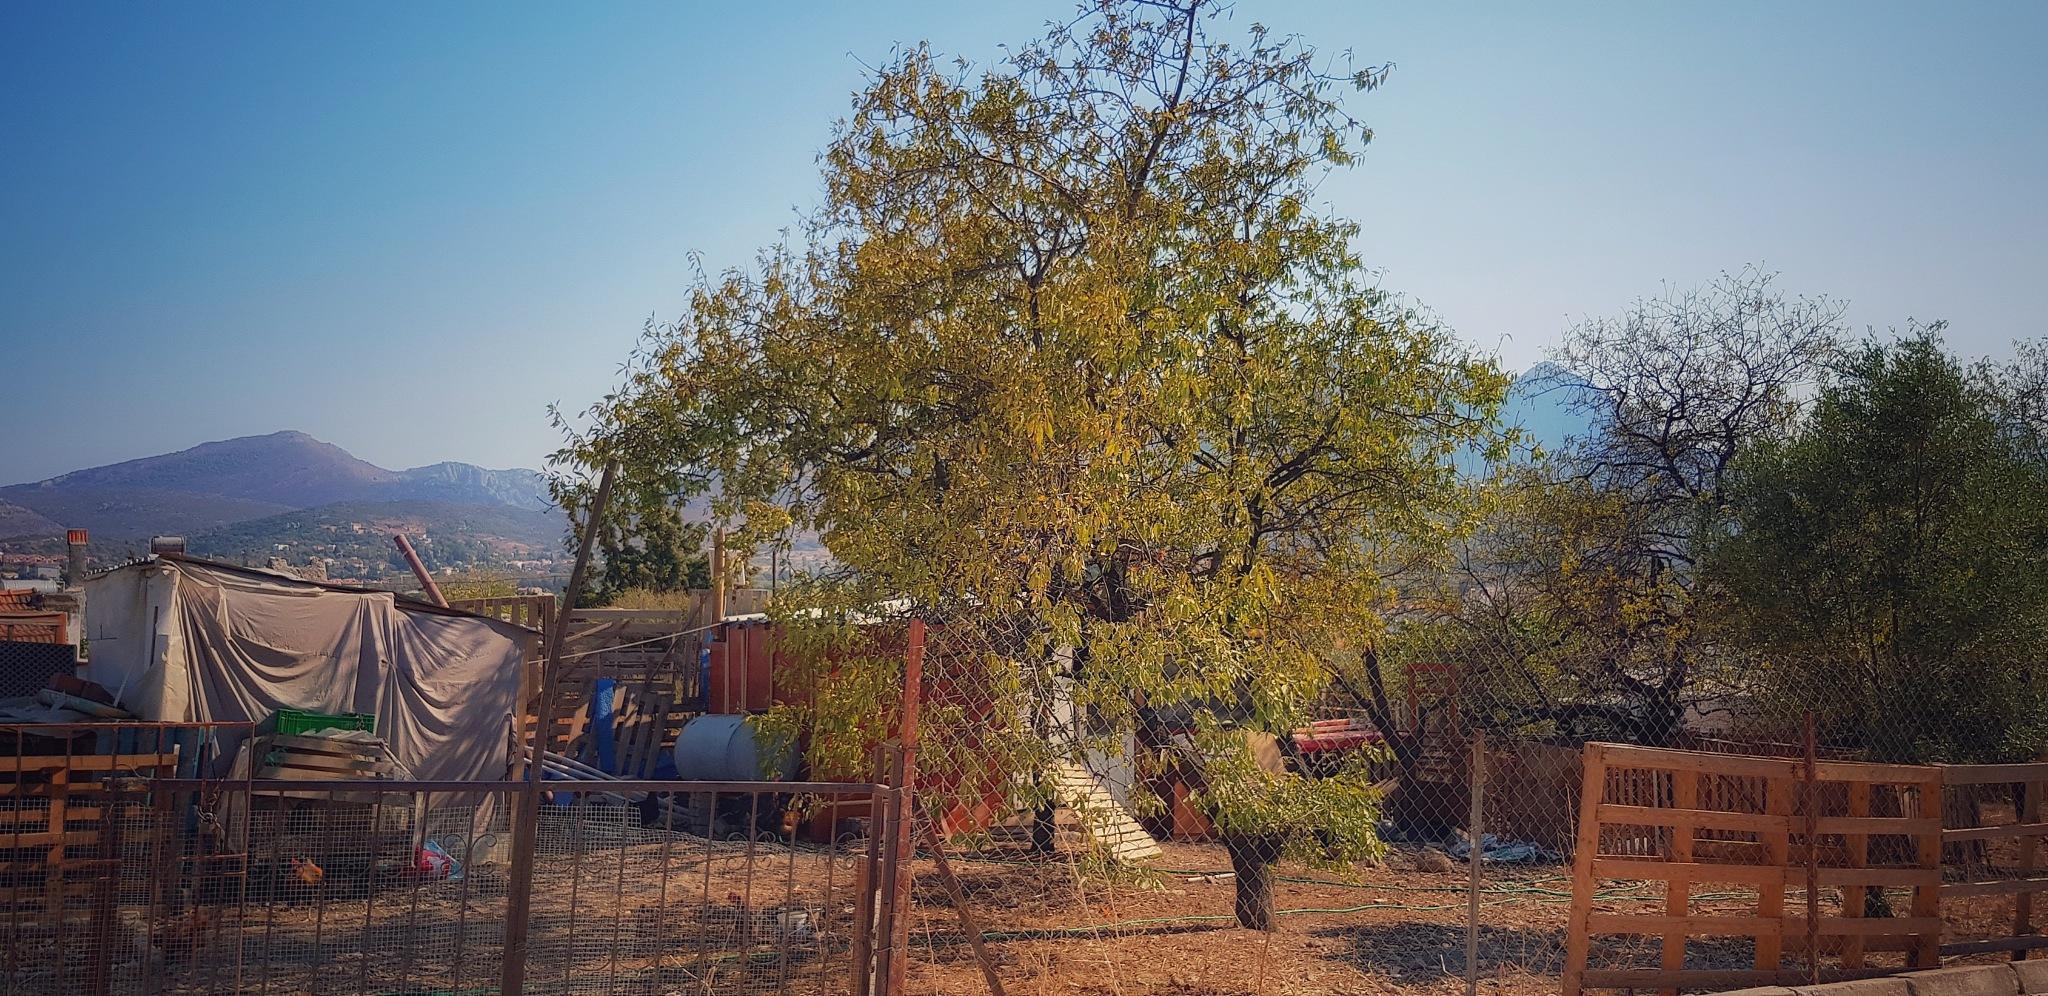 All you need is a tree by Meriç Aksu